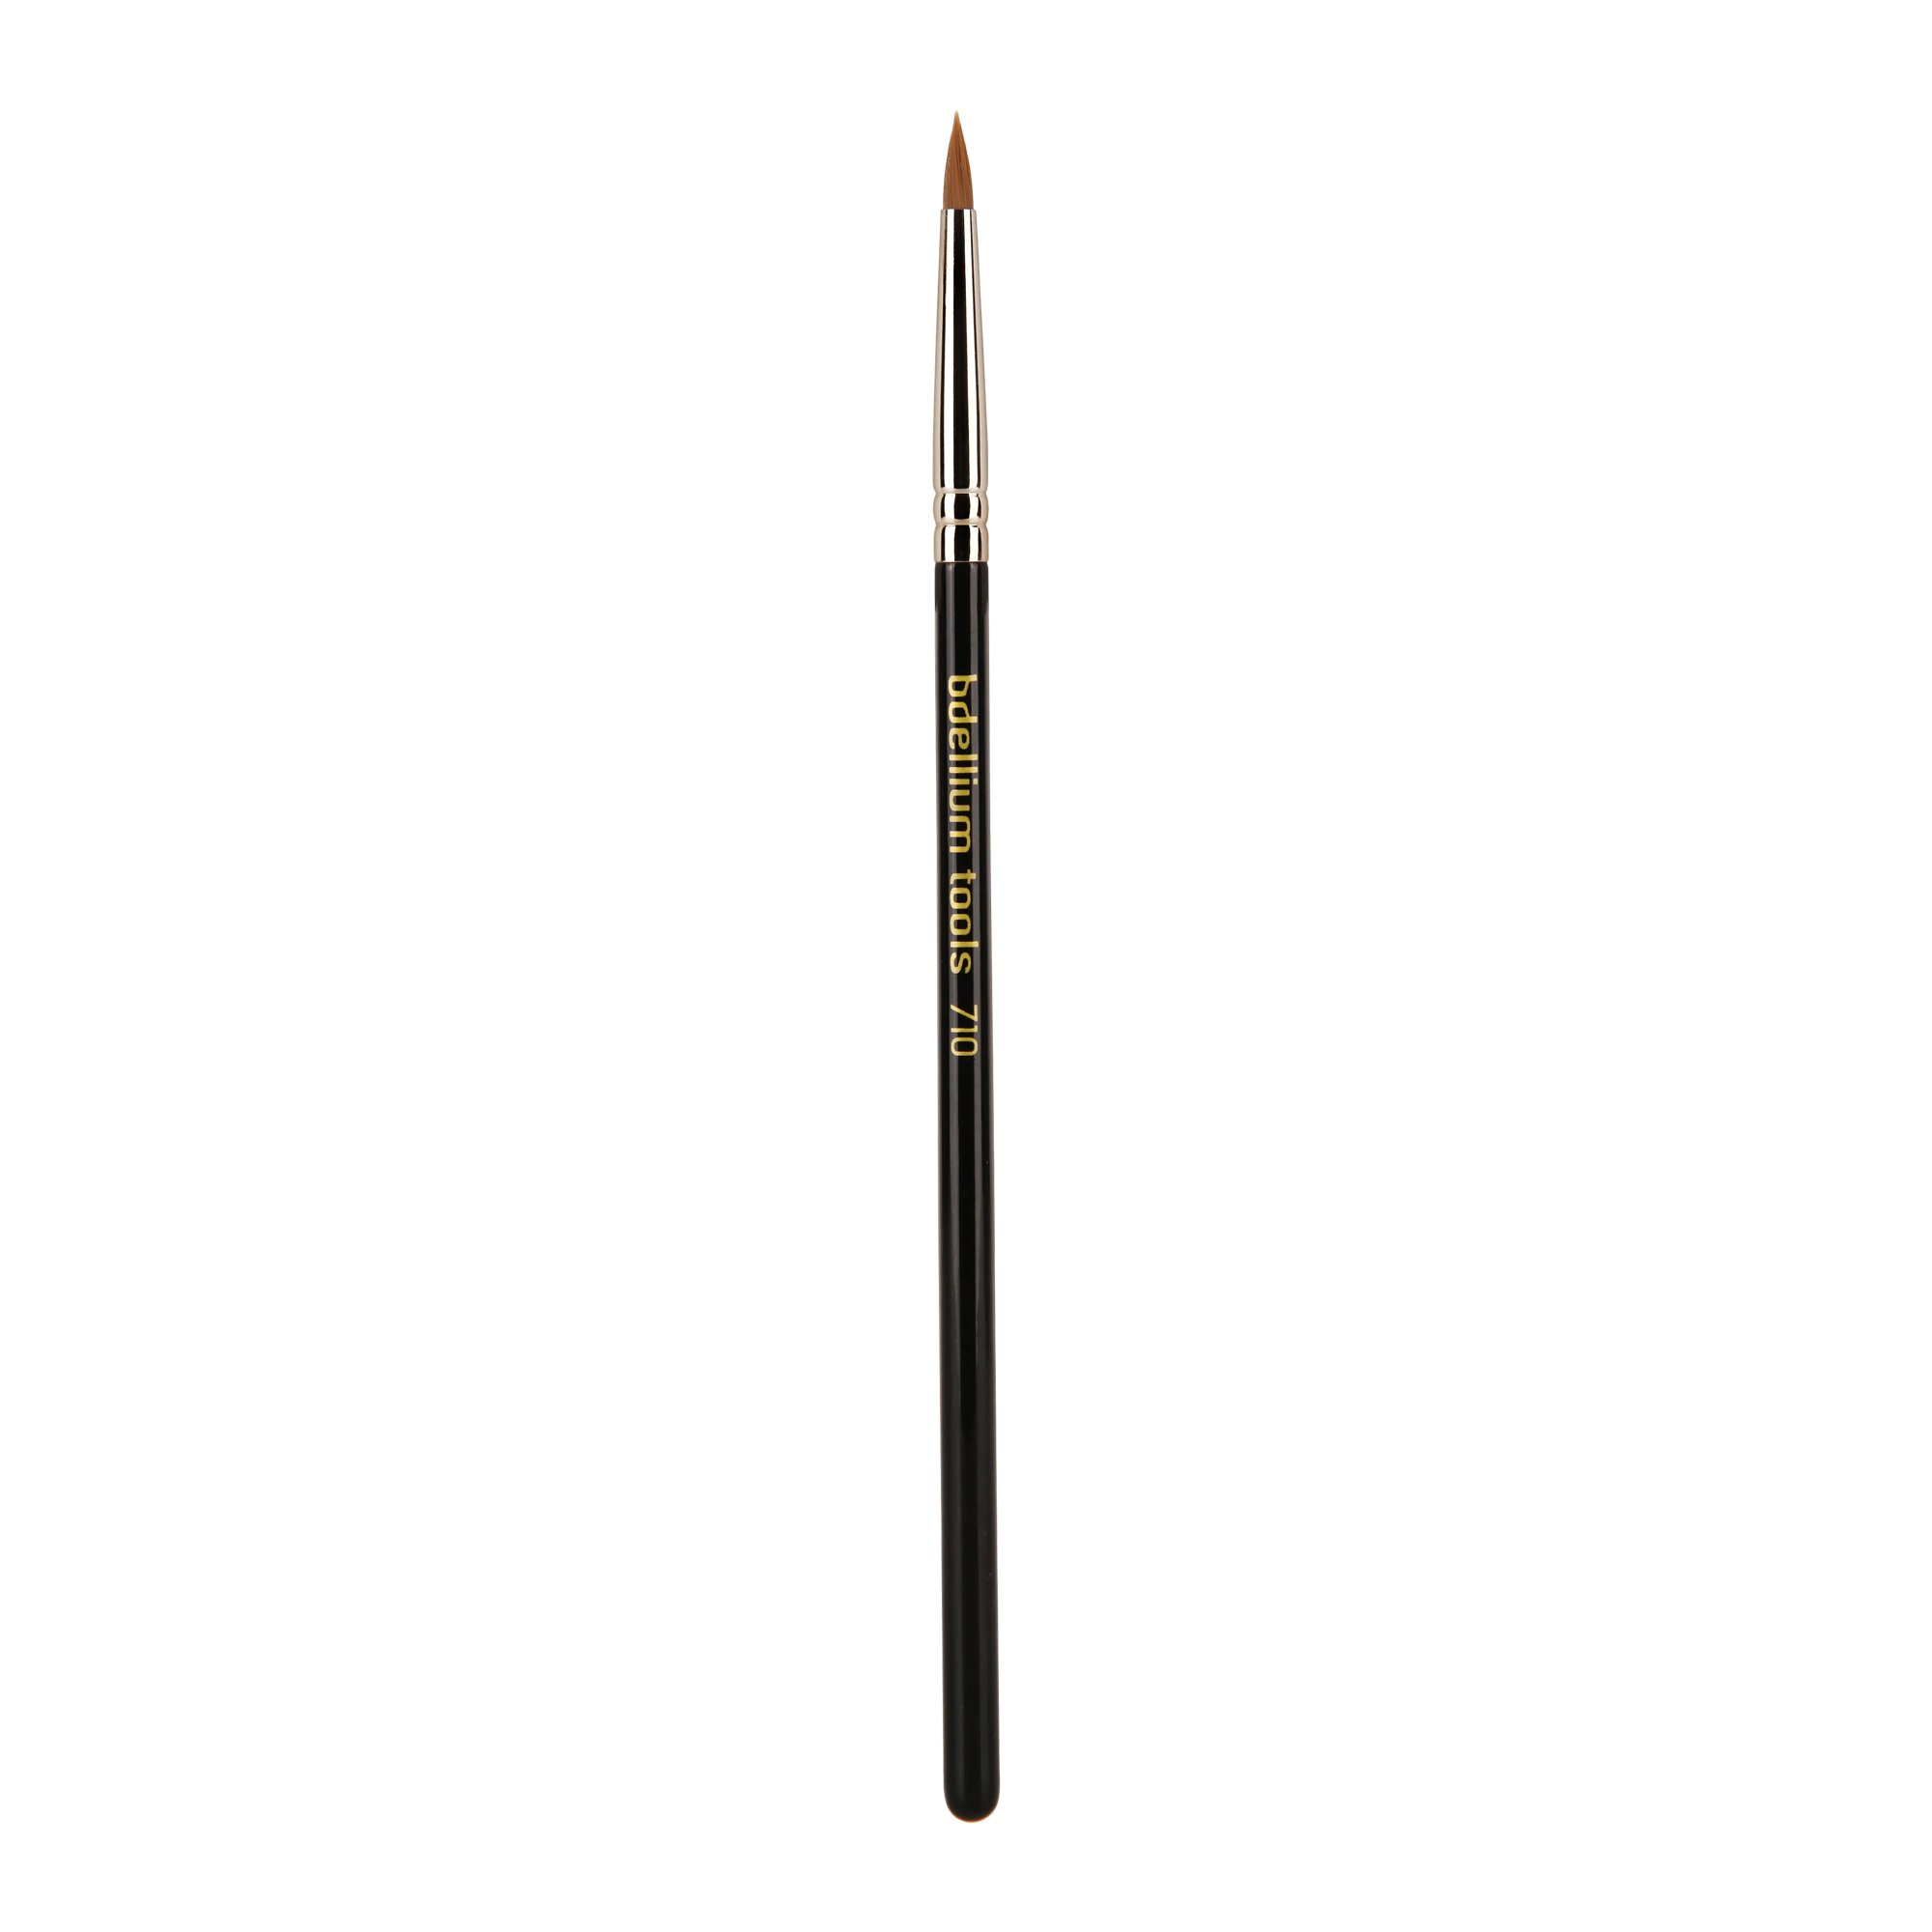 Bdellium Tools Maestro Series Black Eye Liner Brush